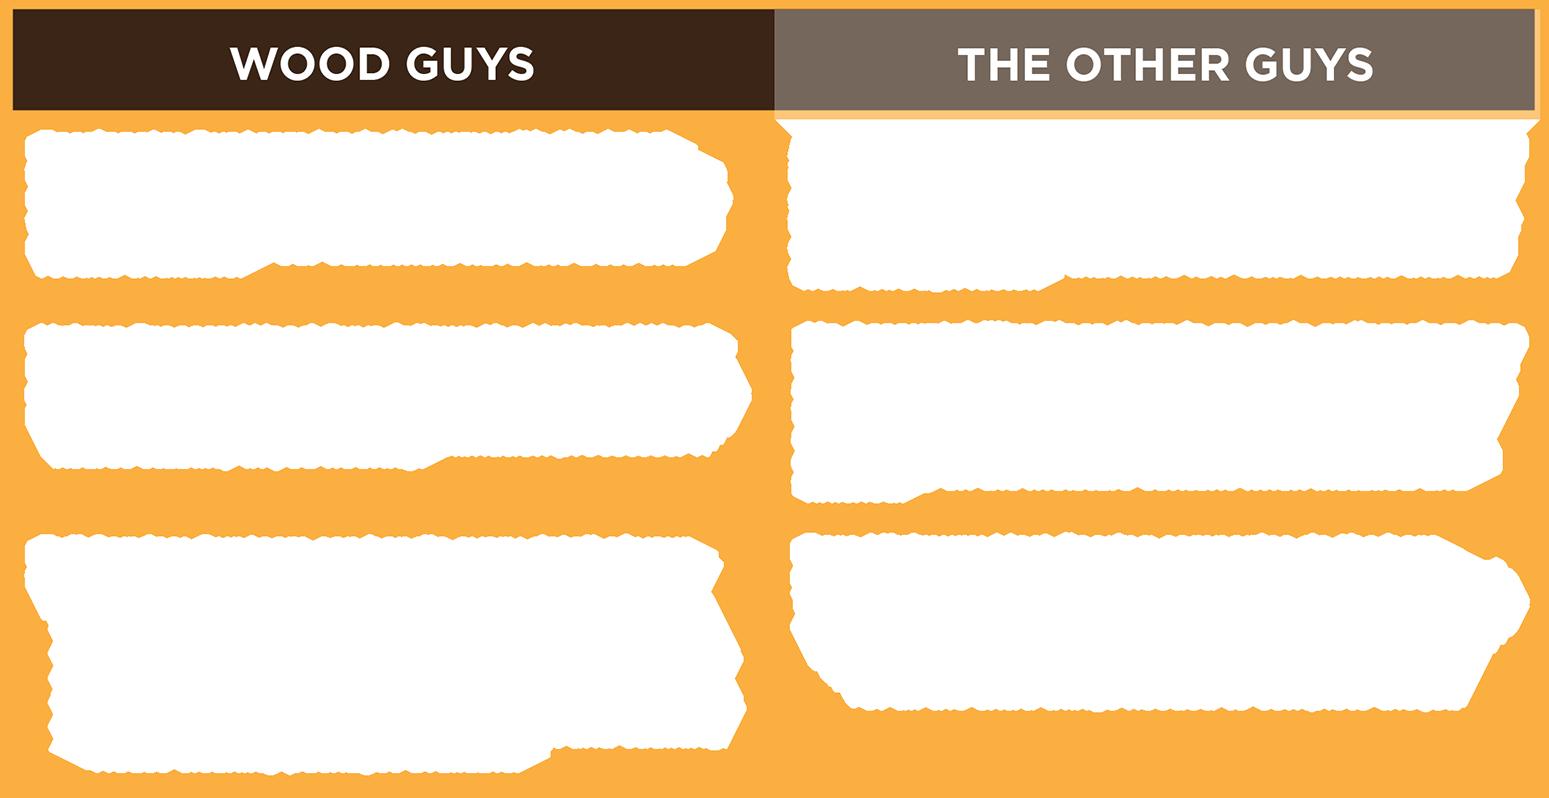 ComparisonChart